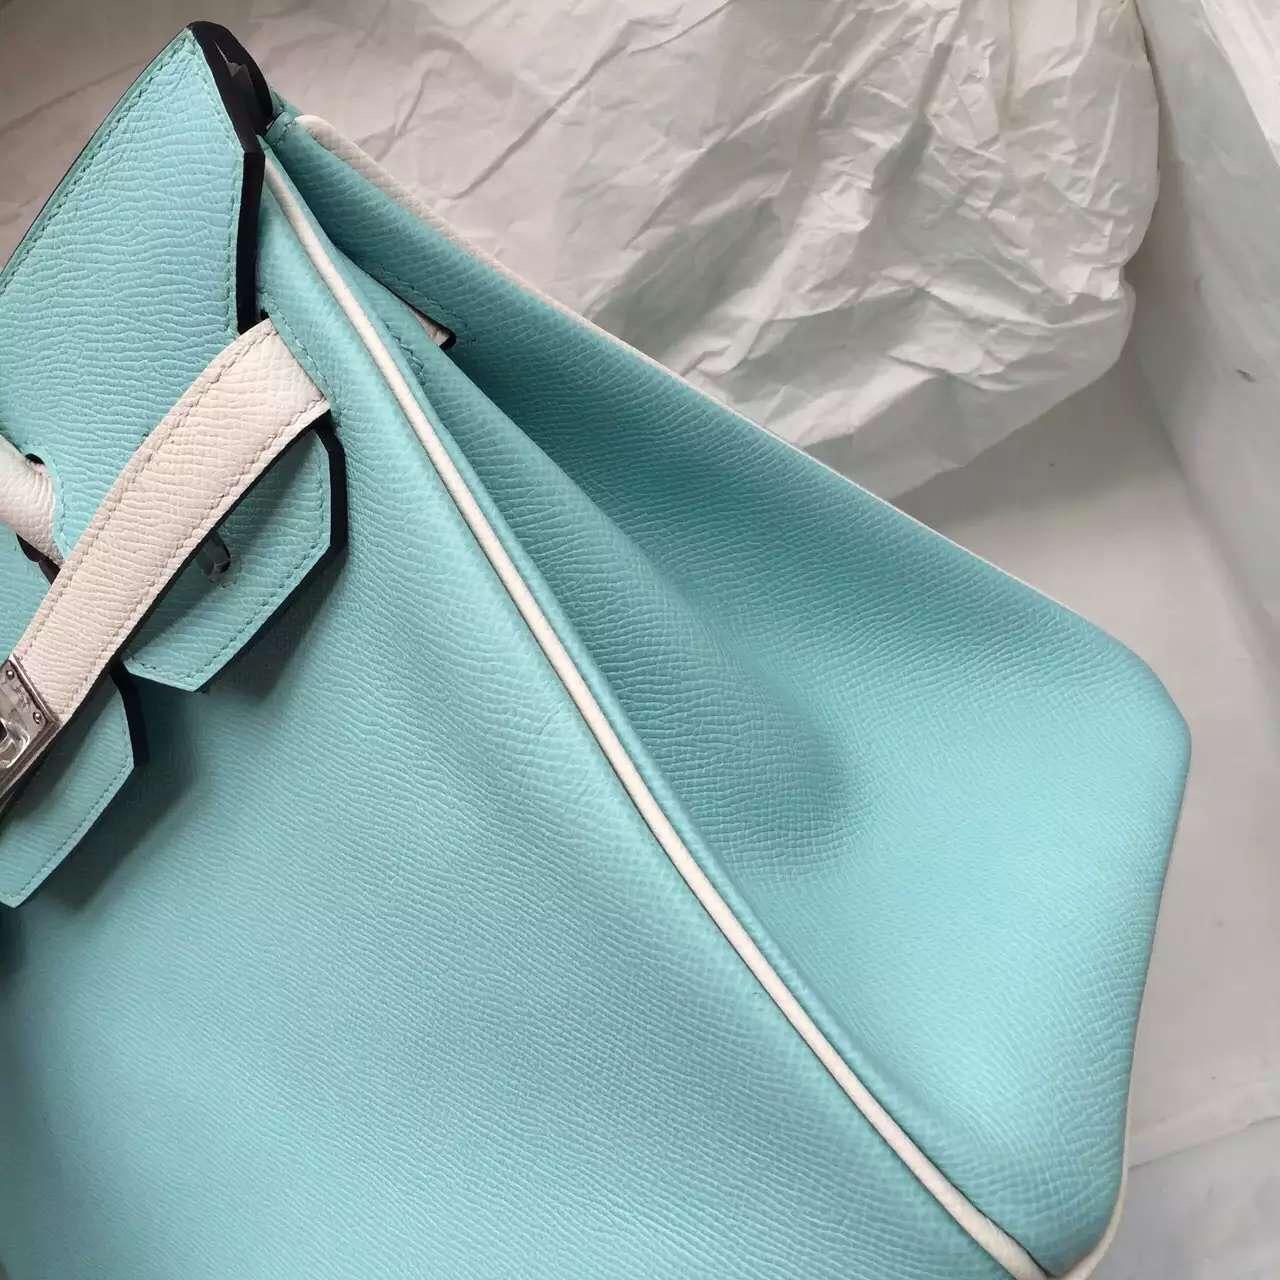 New Fashion Hermes 3P Lagon Blue & White Epsom Leather Birkin Bag 30CM